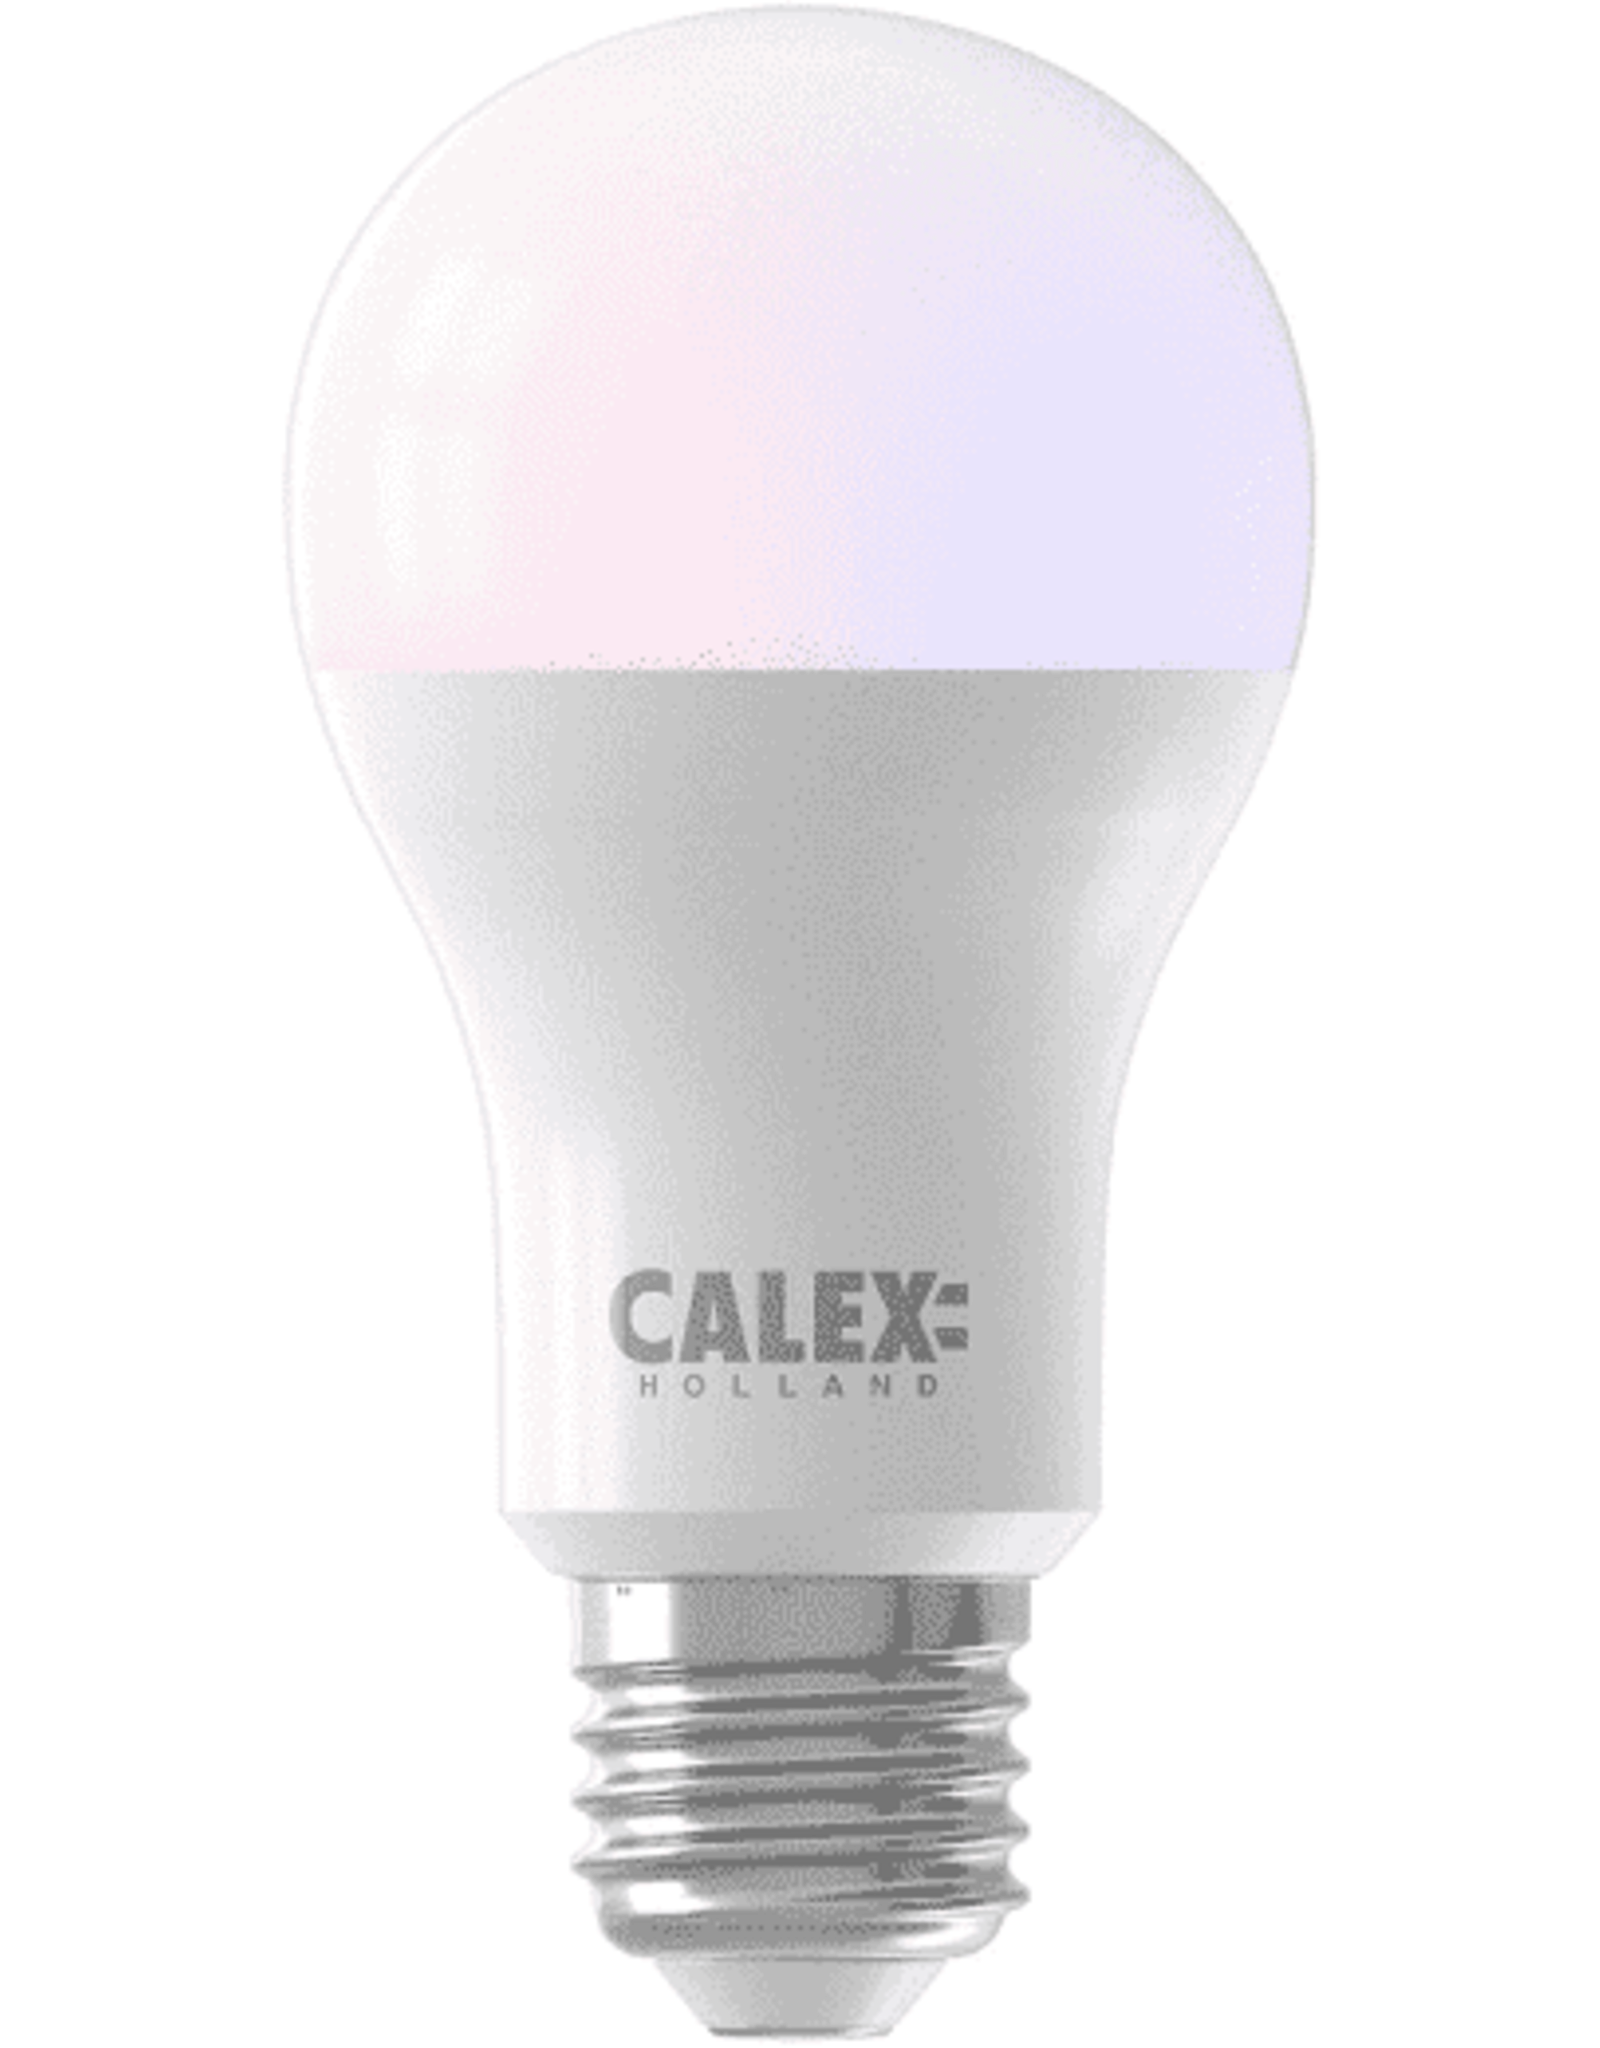 Calex Smart LED GLS-lamp A60 E27220-240V 8,5W 806lm 2200-4000K+RGB, energy label A+